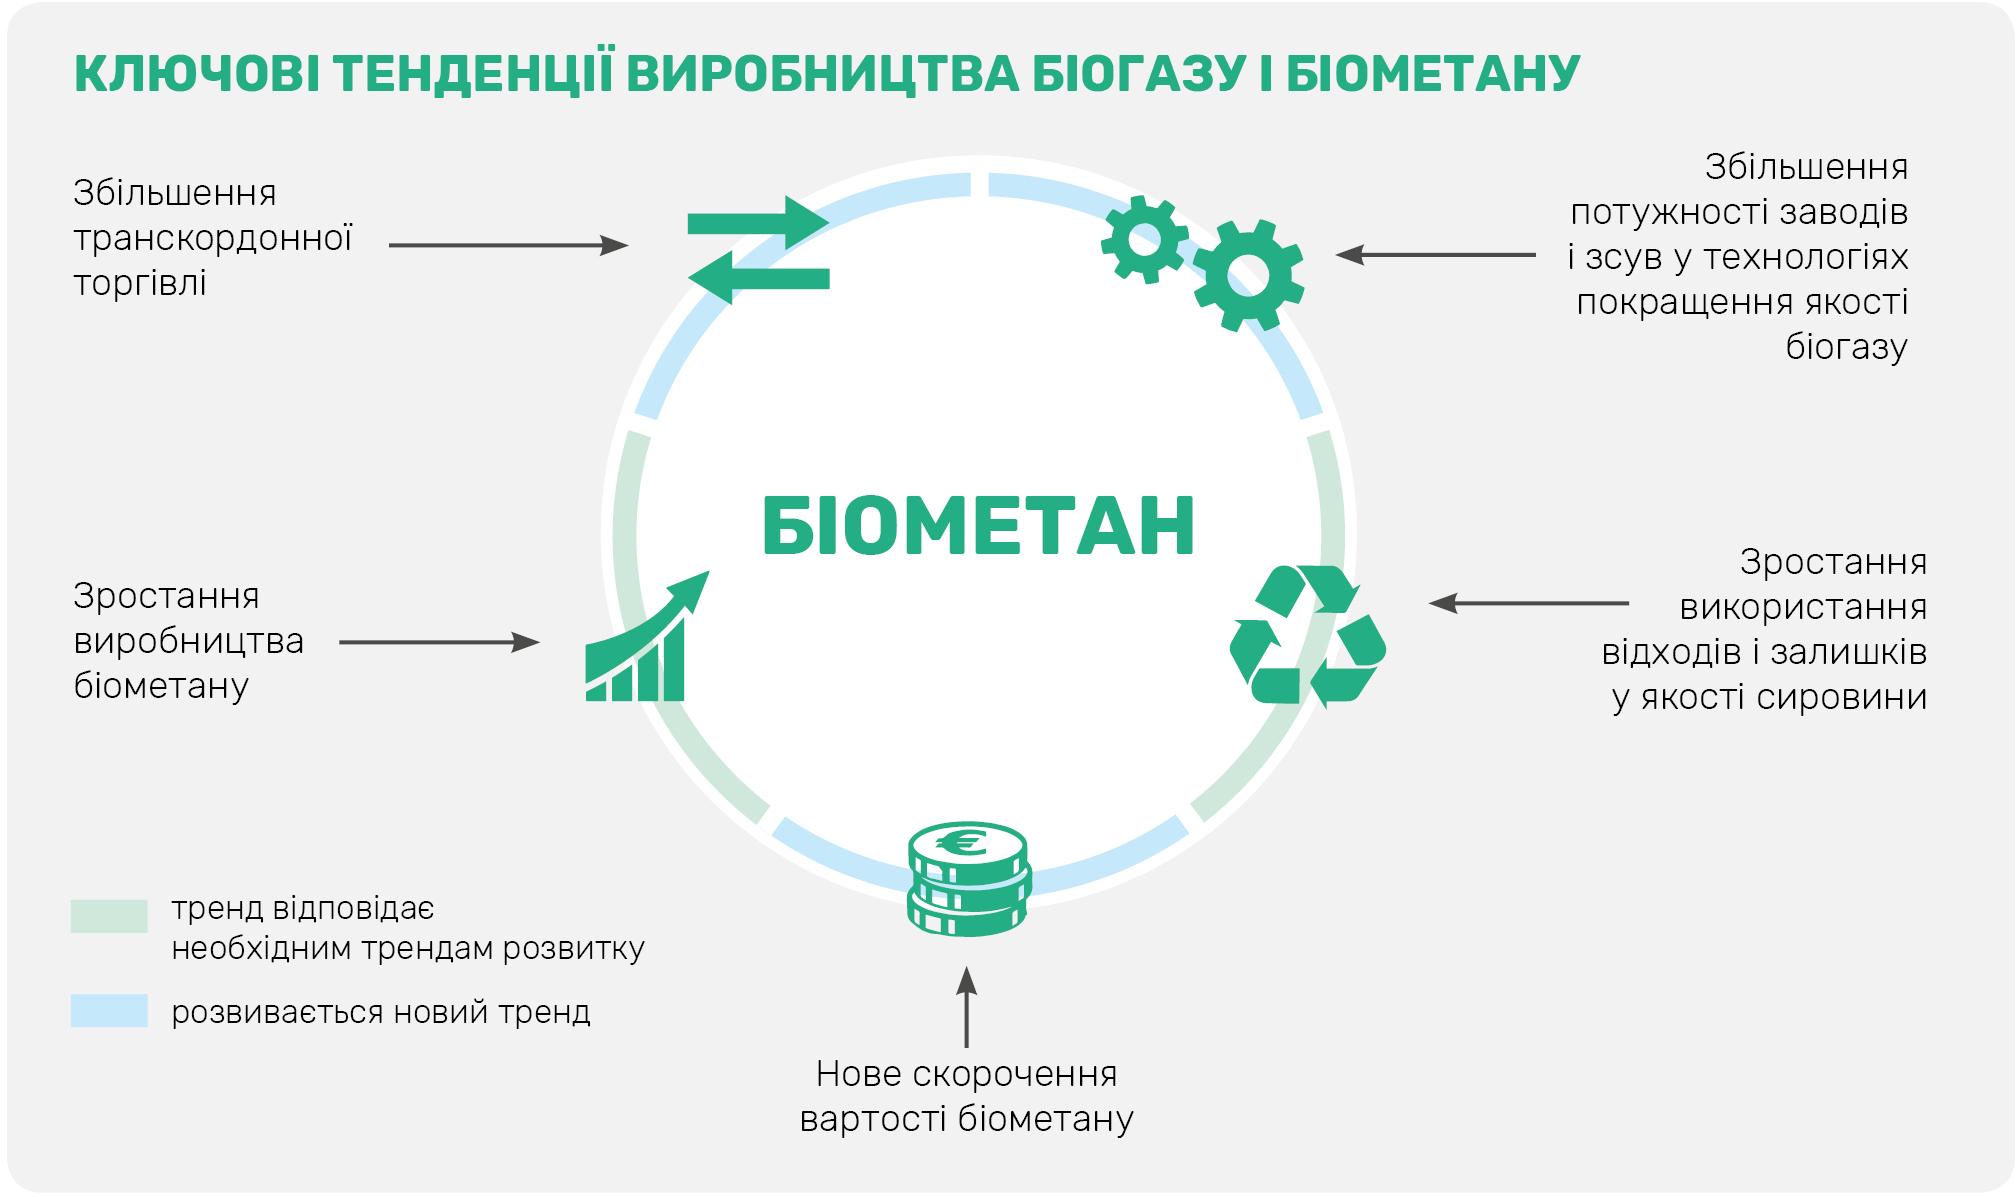 Main factors of EU biomethane development